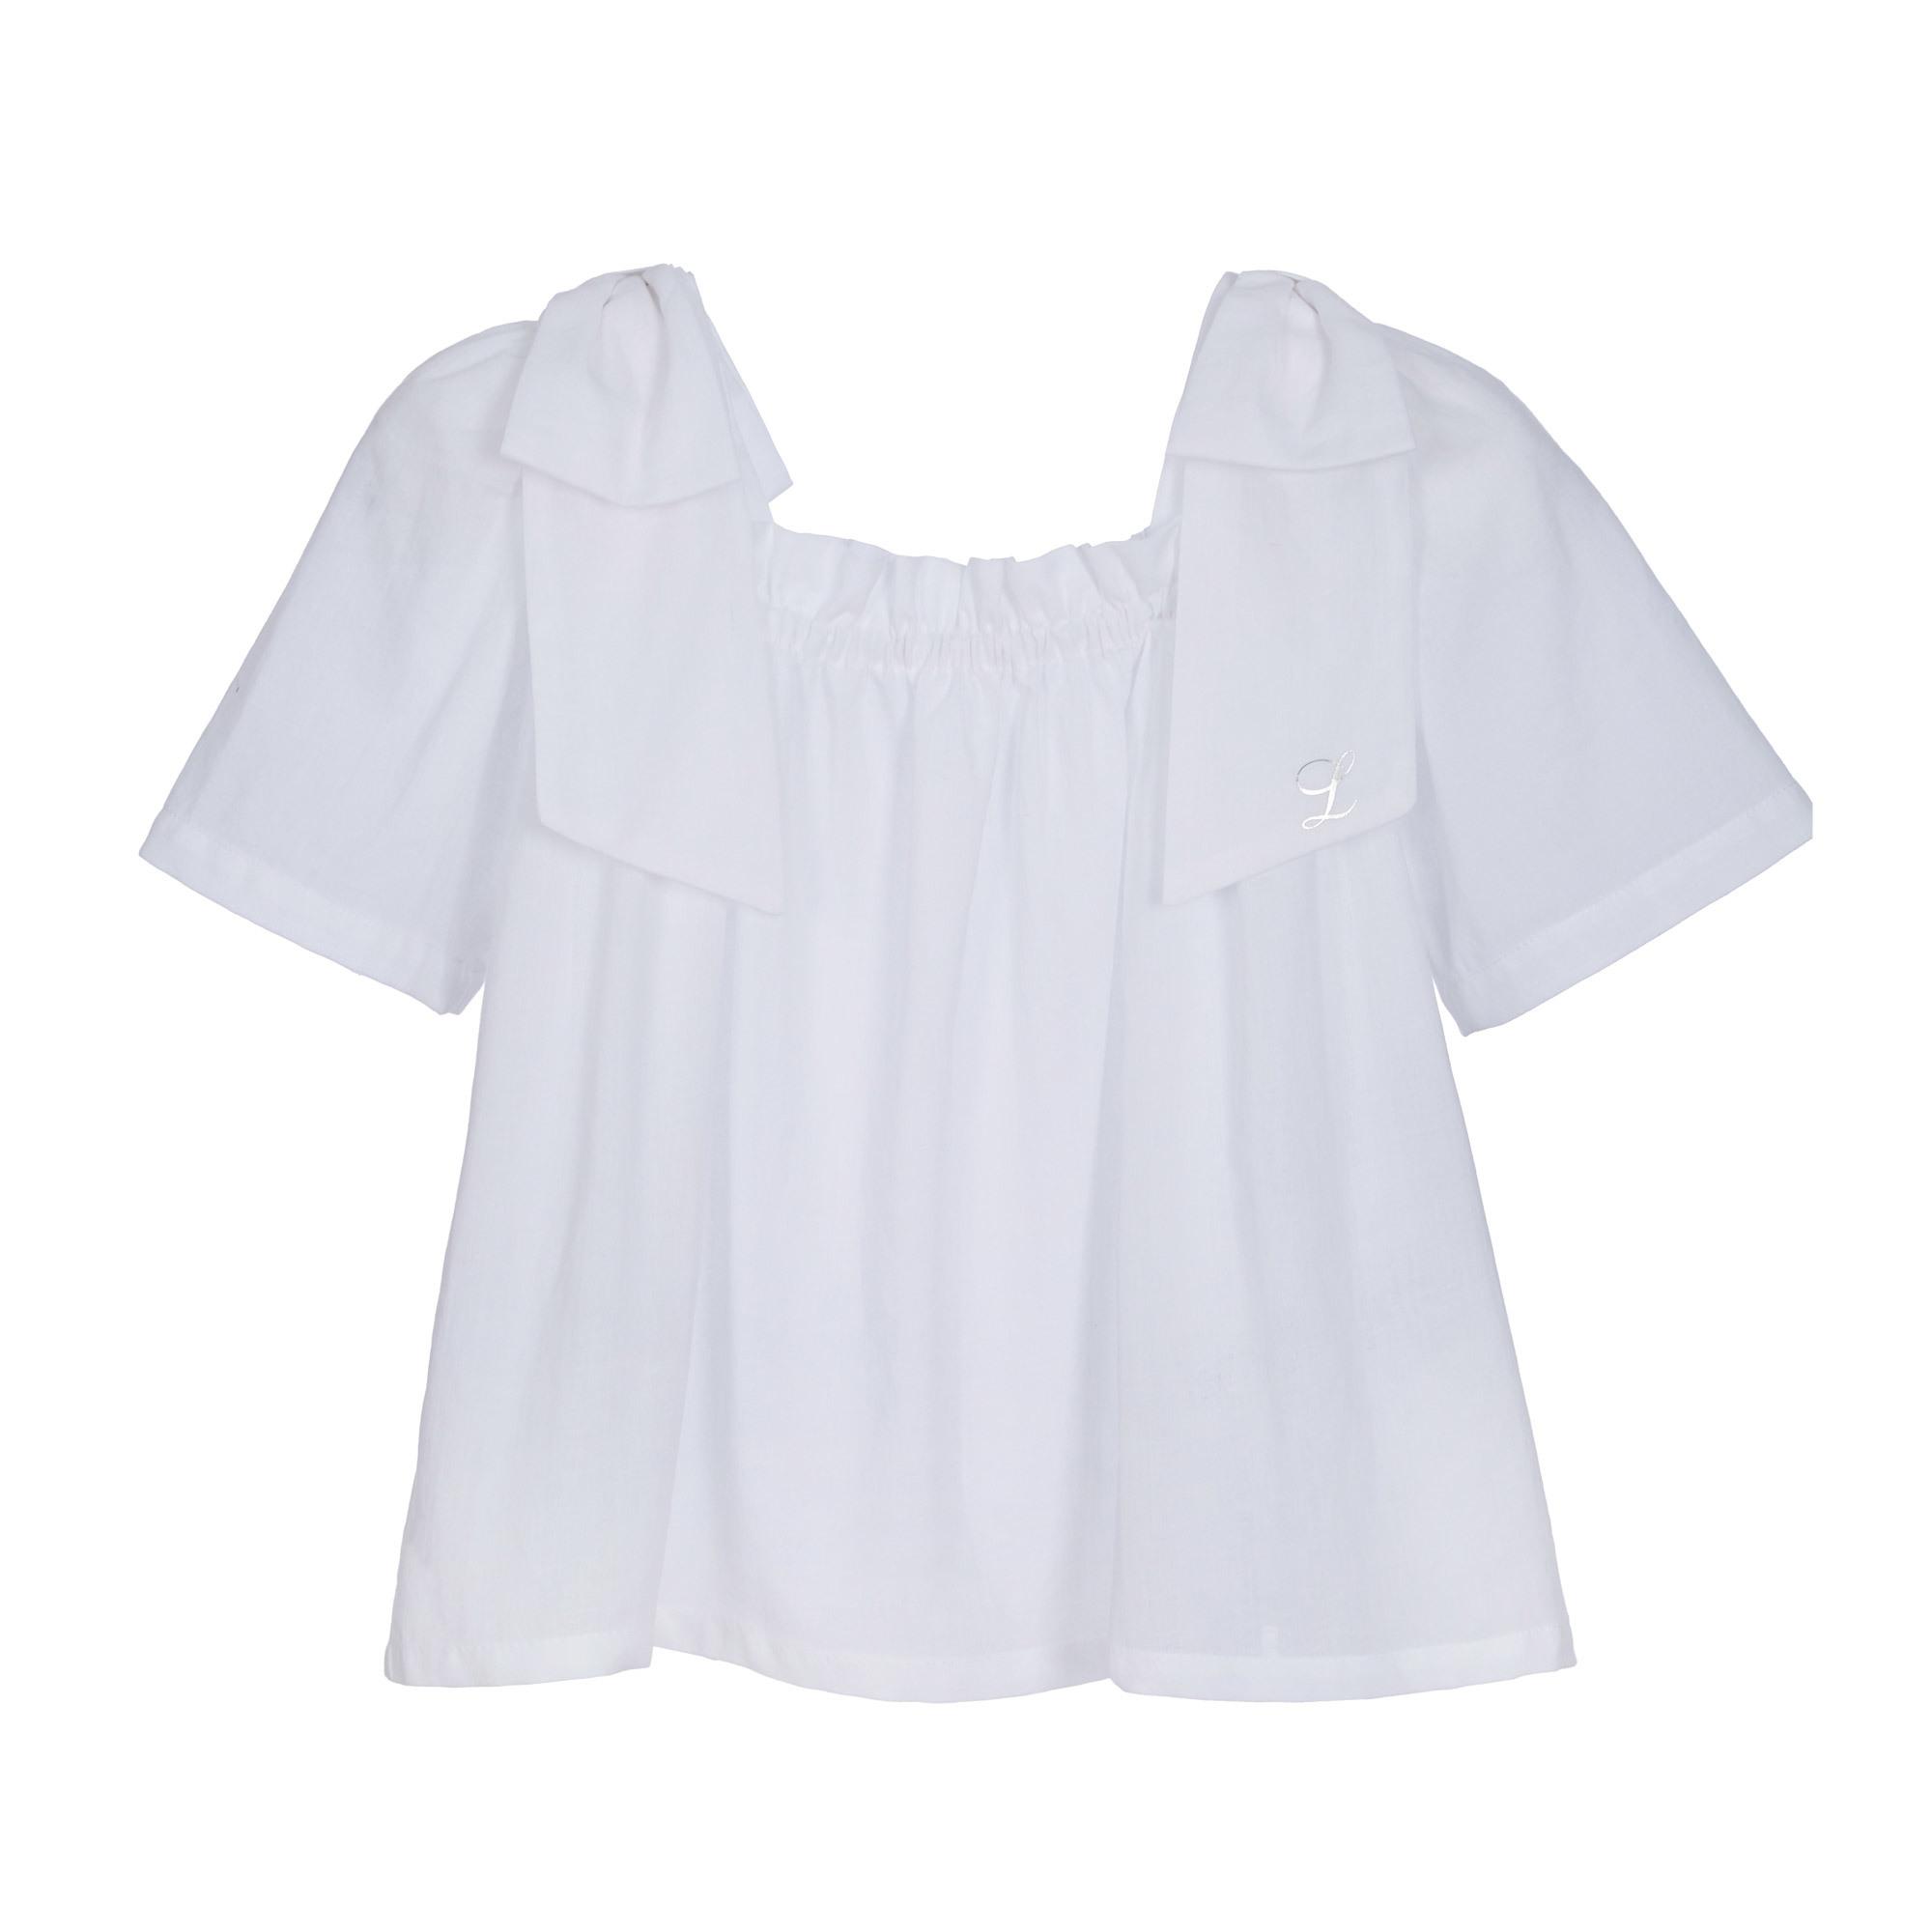 e767cbb9a4d Παιδικά Ρούχα - Lapin House